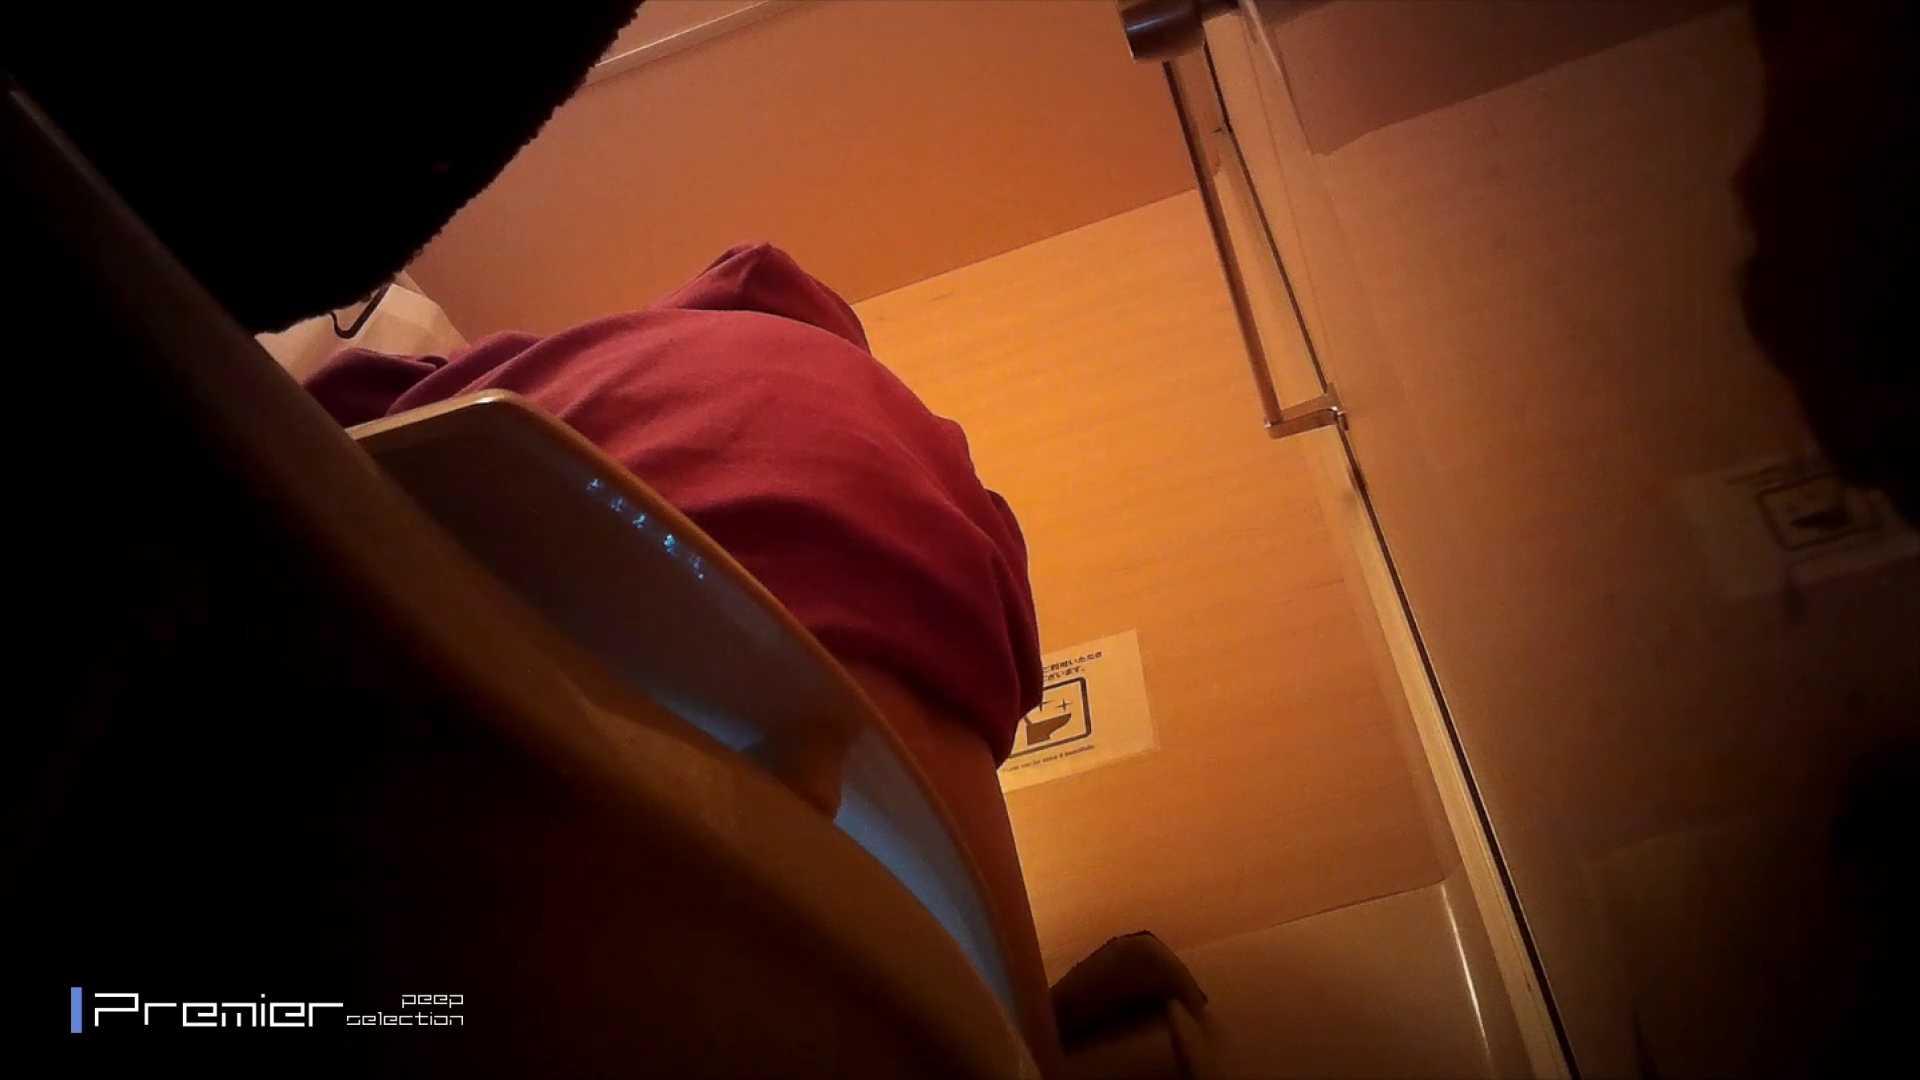 ▲2017_14位▲ 某格安温泉地宿泊施設トイレ盗撮 Vol.02 盗撮 | VR  93枚 67